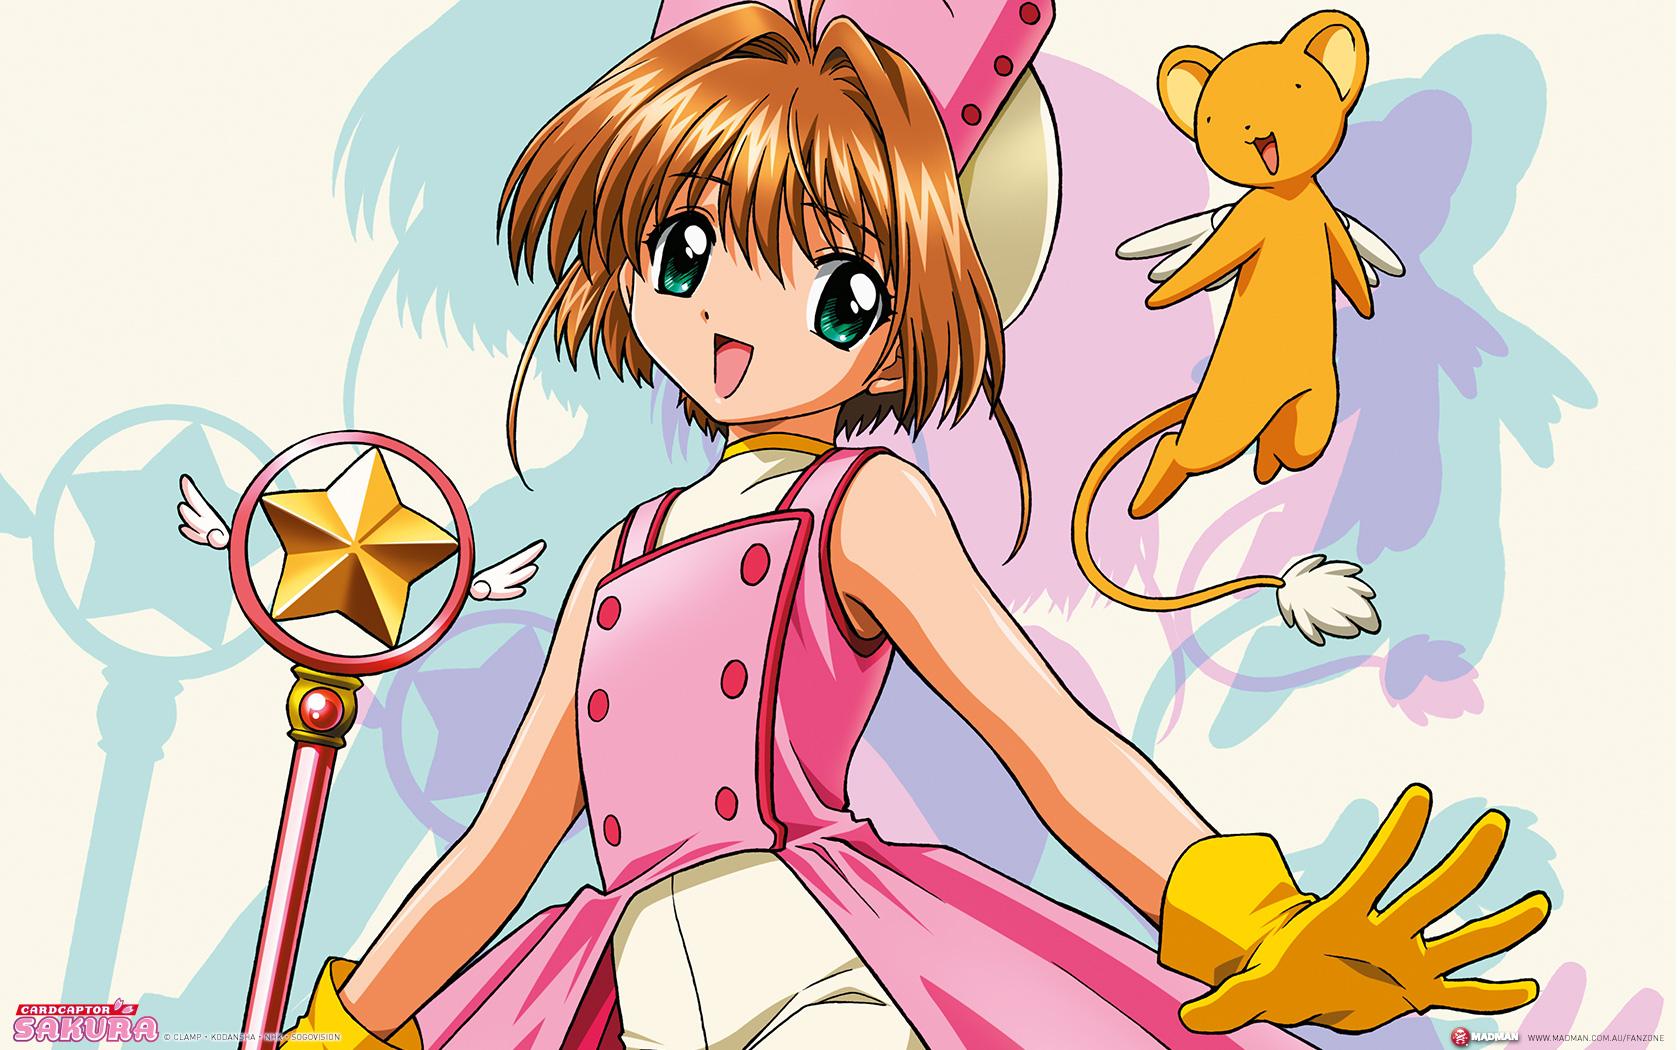 Cosplay - Cardcaptor Sakura